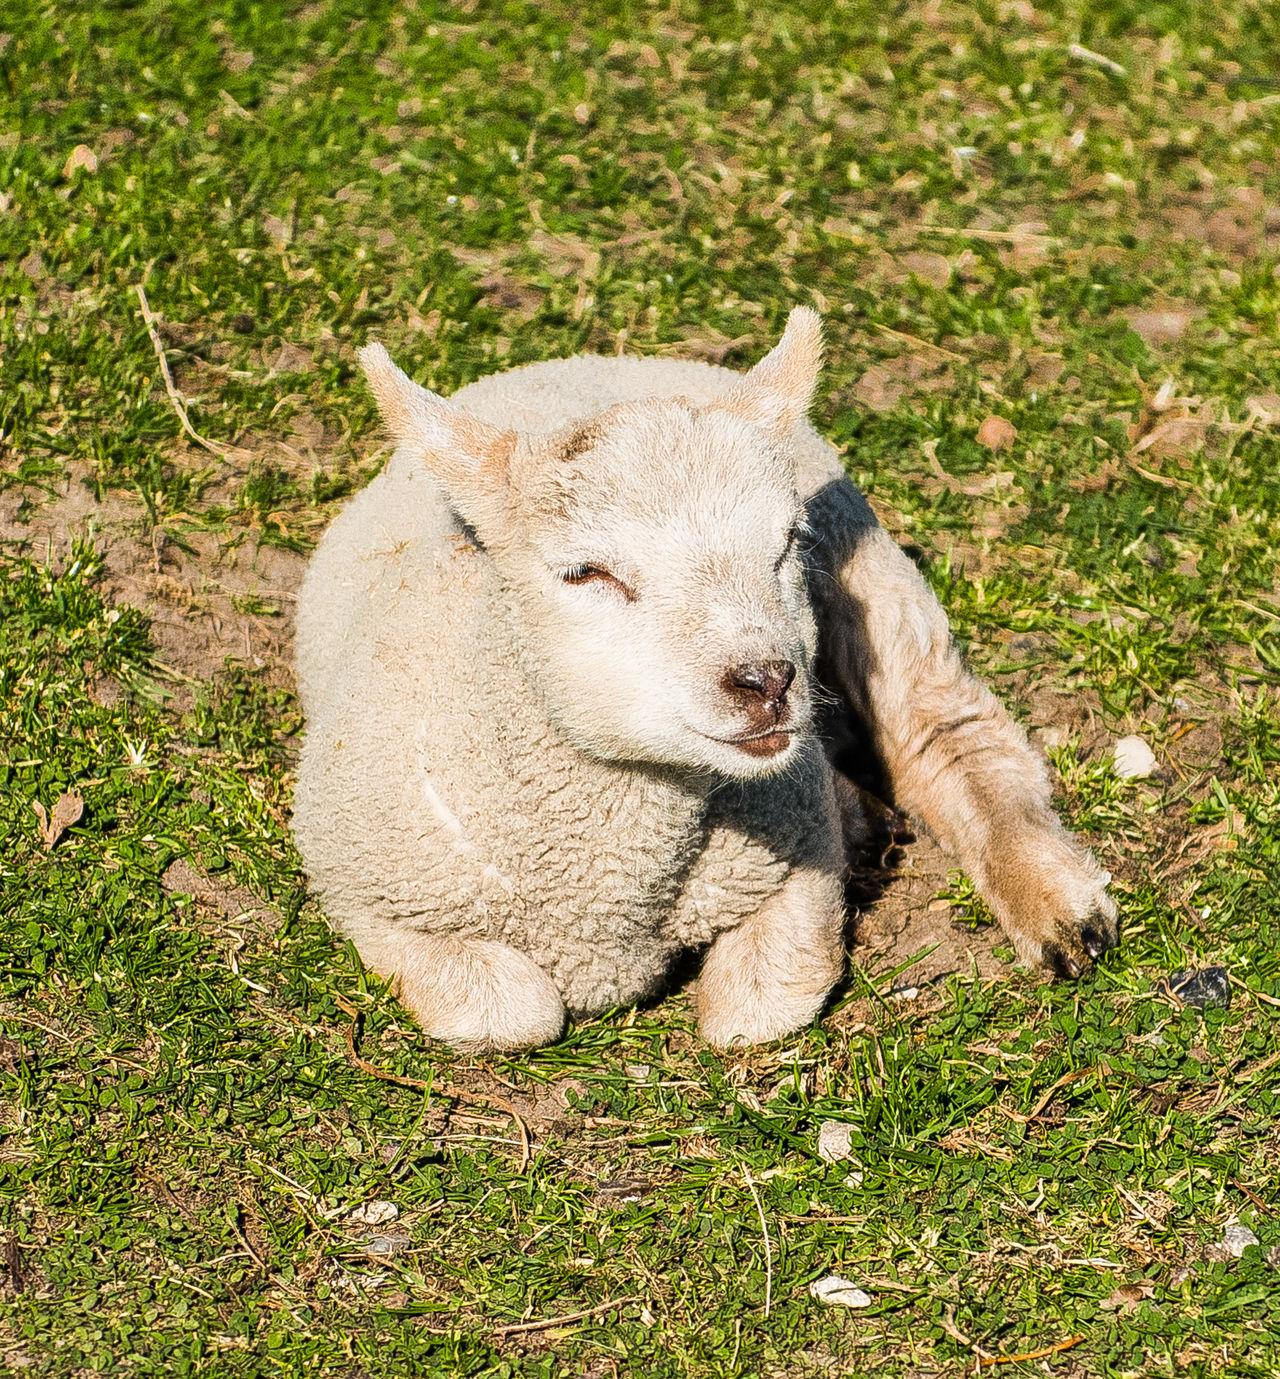 Animal Animal Themes Animals Bauernhof Day Easter Lamb Easterlamb Farm Farm Life Grass Lamb Lamm Mammal Nature No People Outdoors